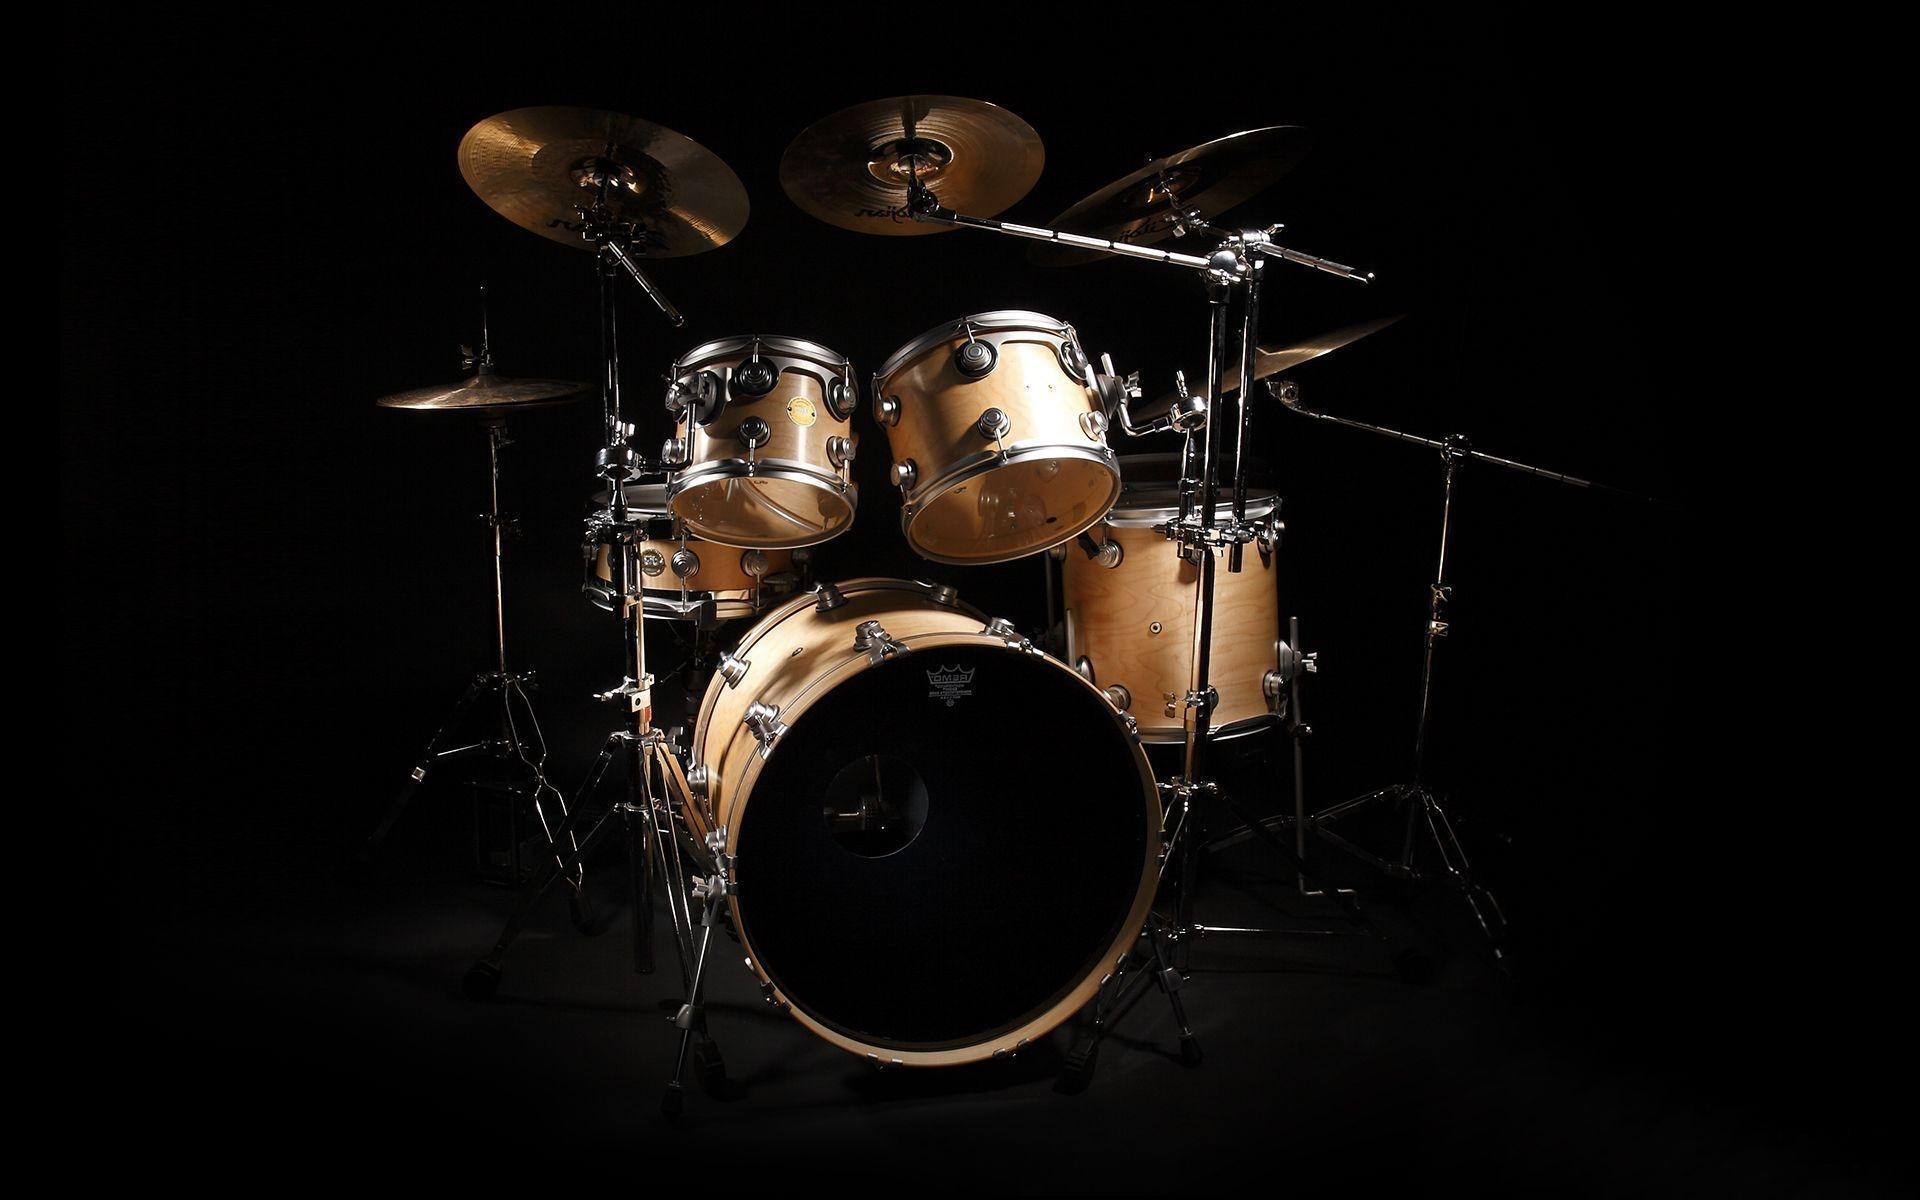 drum set wallpapers - wallpaper cave